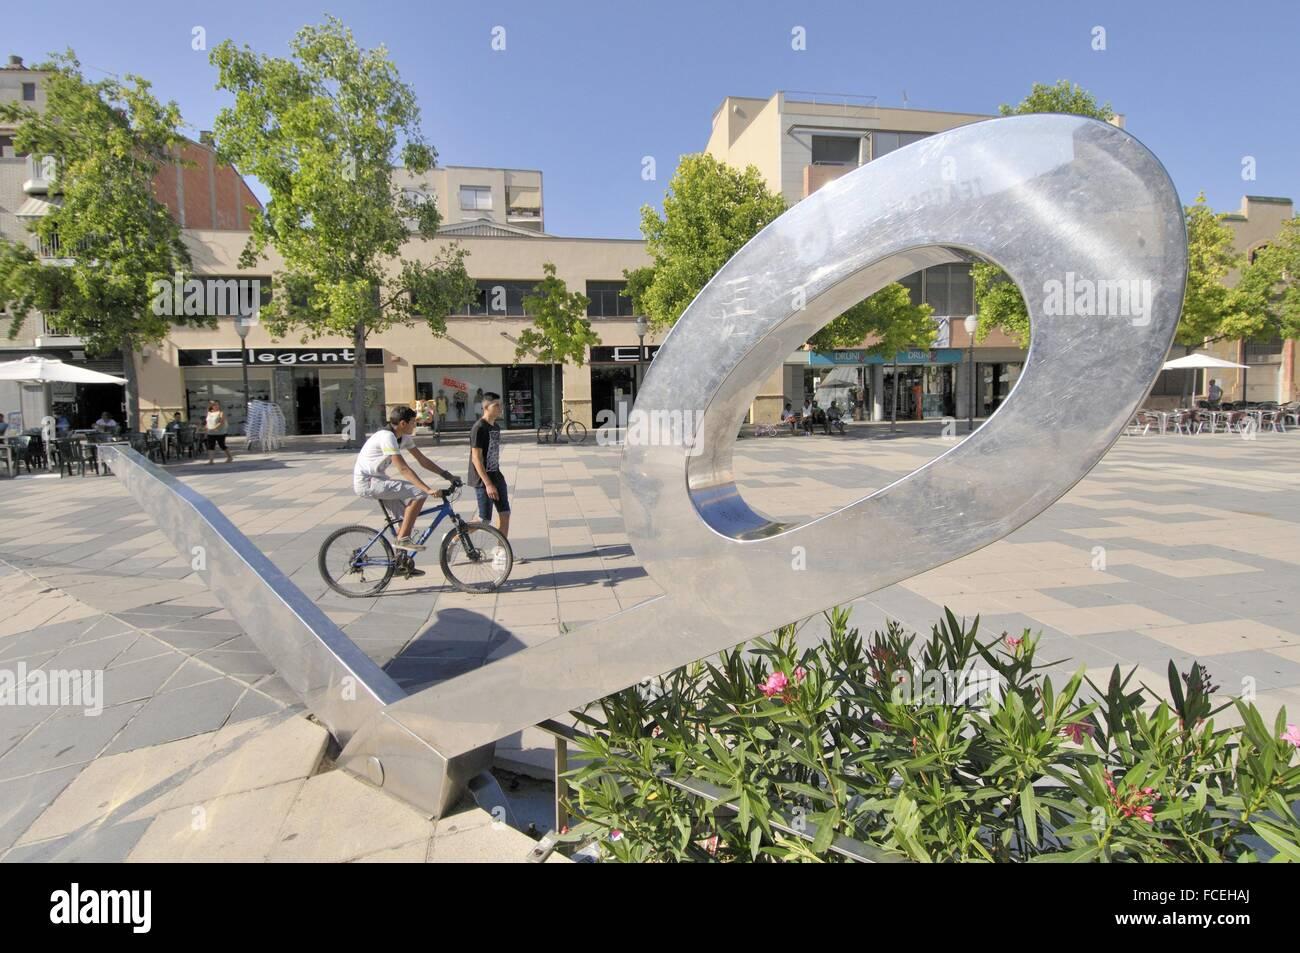 Cal Font square. Scissors Sculpture. Igualada, capital of Anoia Comarca, Barcelona, Catalonia, Spain - Stock Image